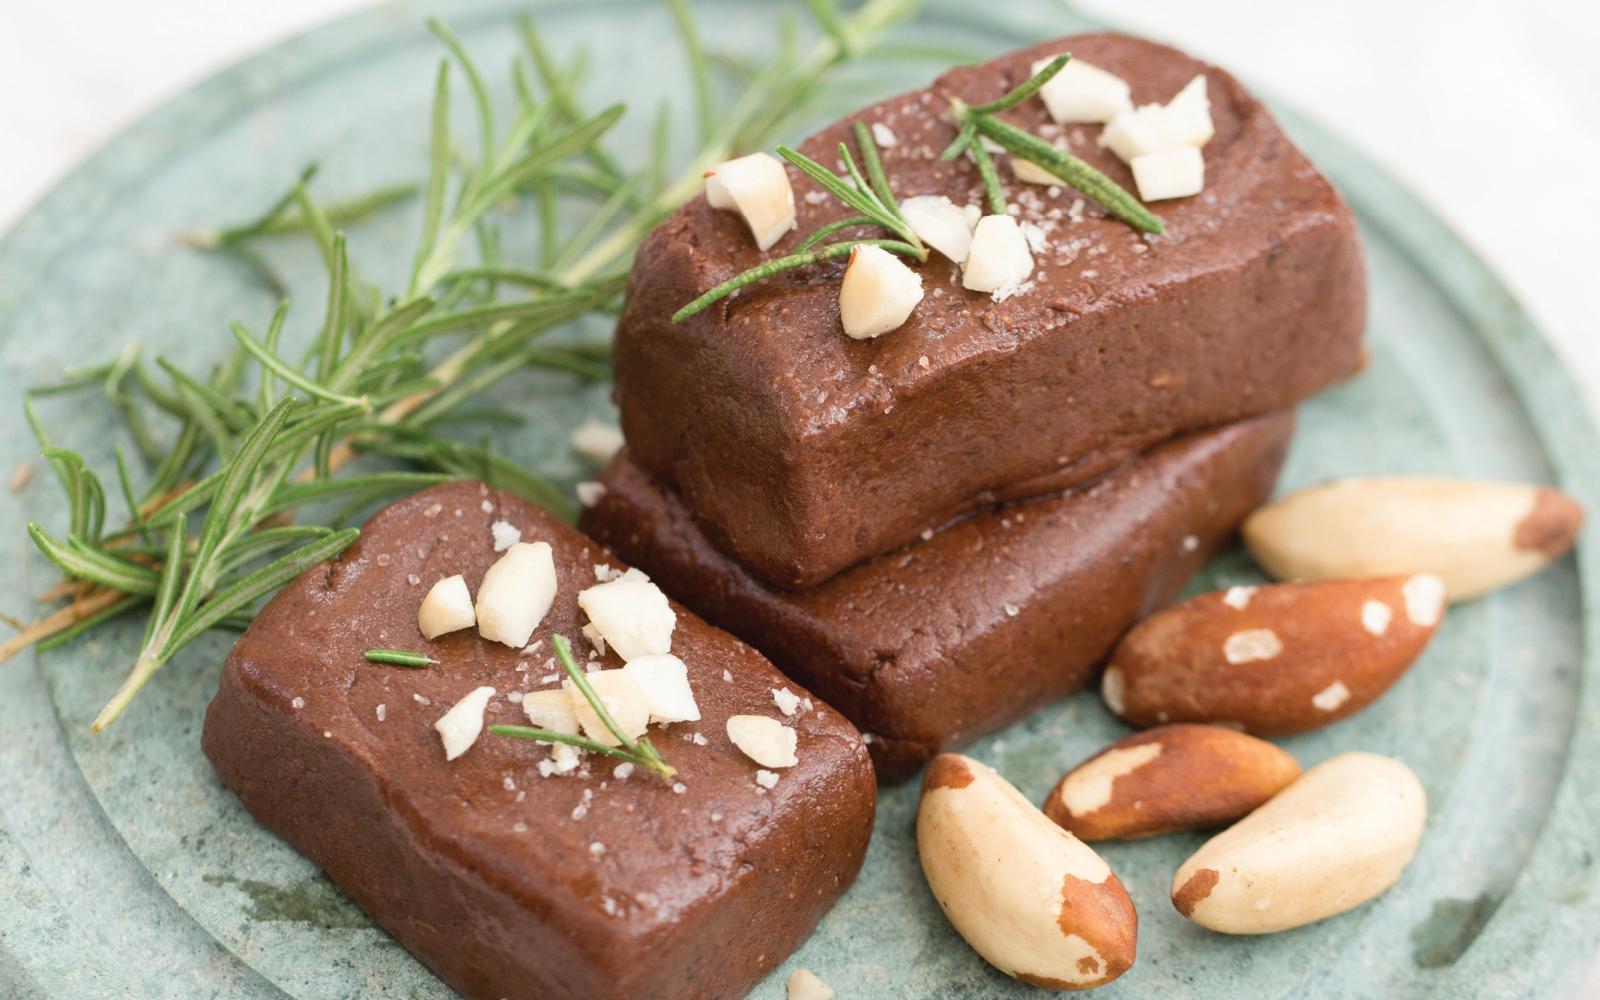 Vegan Brazil Nut Fudge